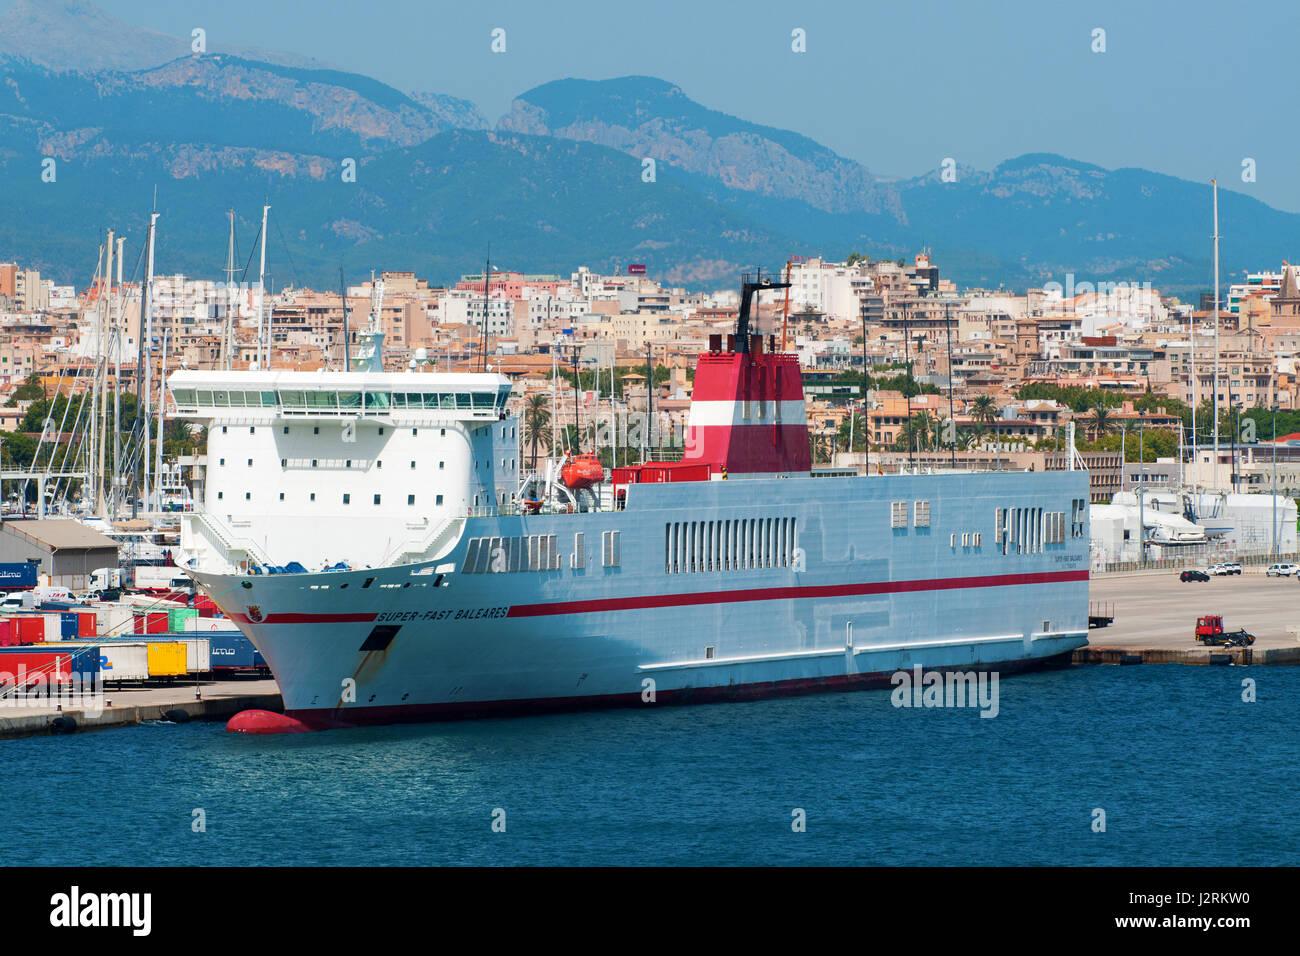 SUPER FAST BALEARES (Portugal Flag), RO-RO CARGO in Palma de Mallorca,   Island of Majorca, Balearic Islands, Spain, - Stock Image